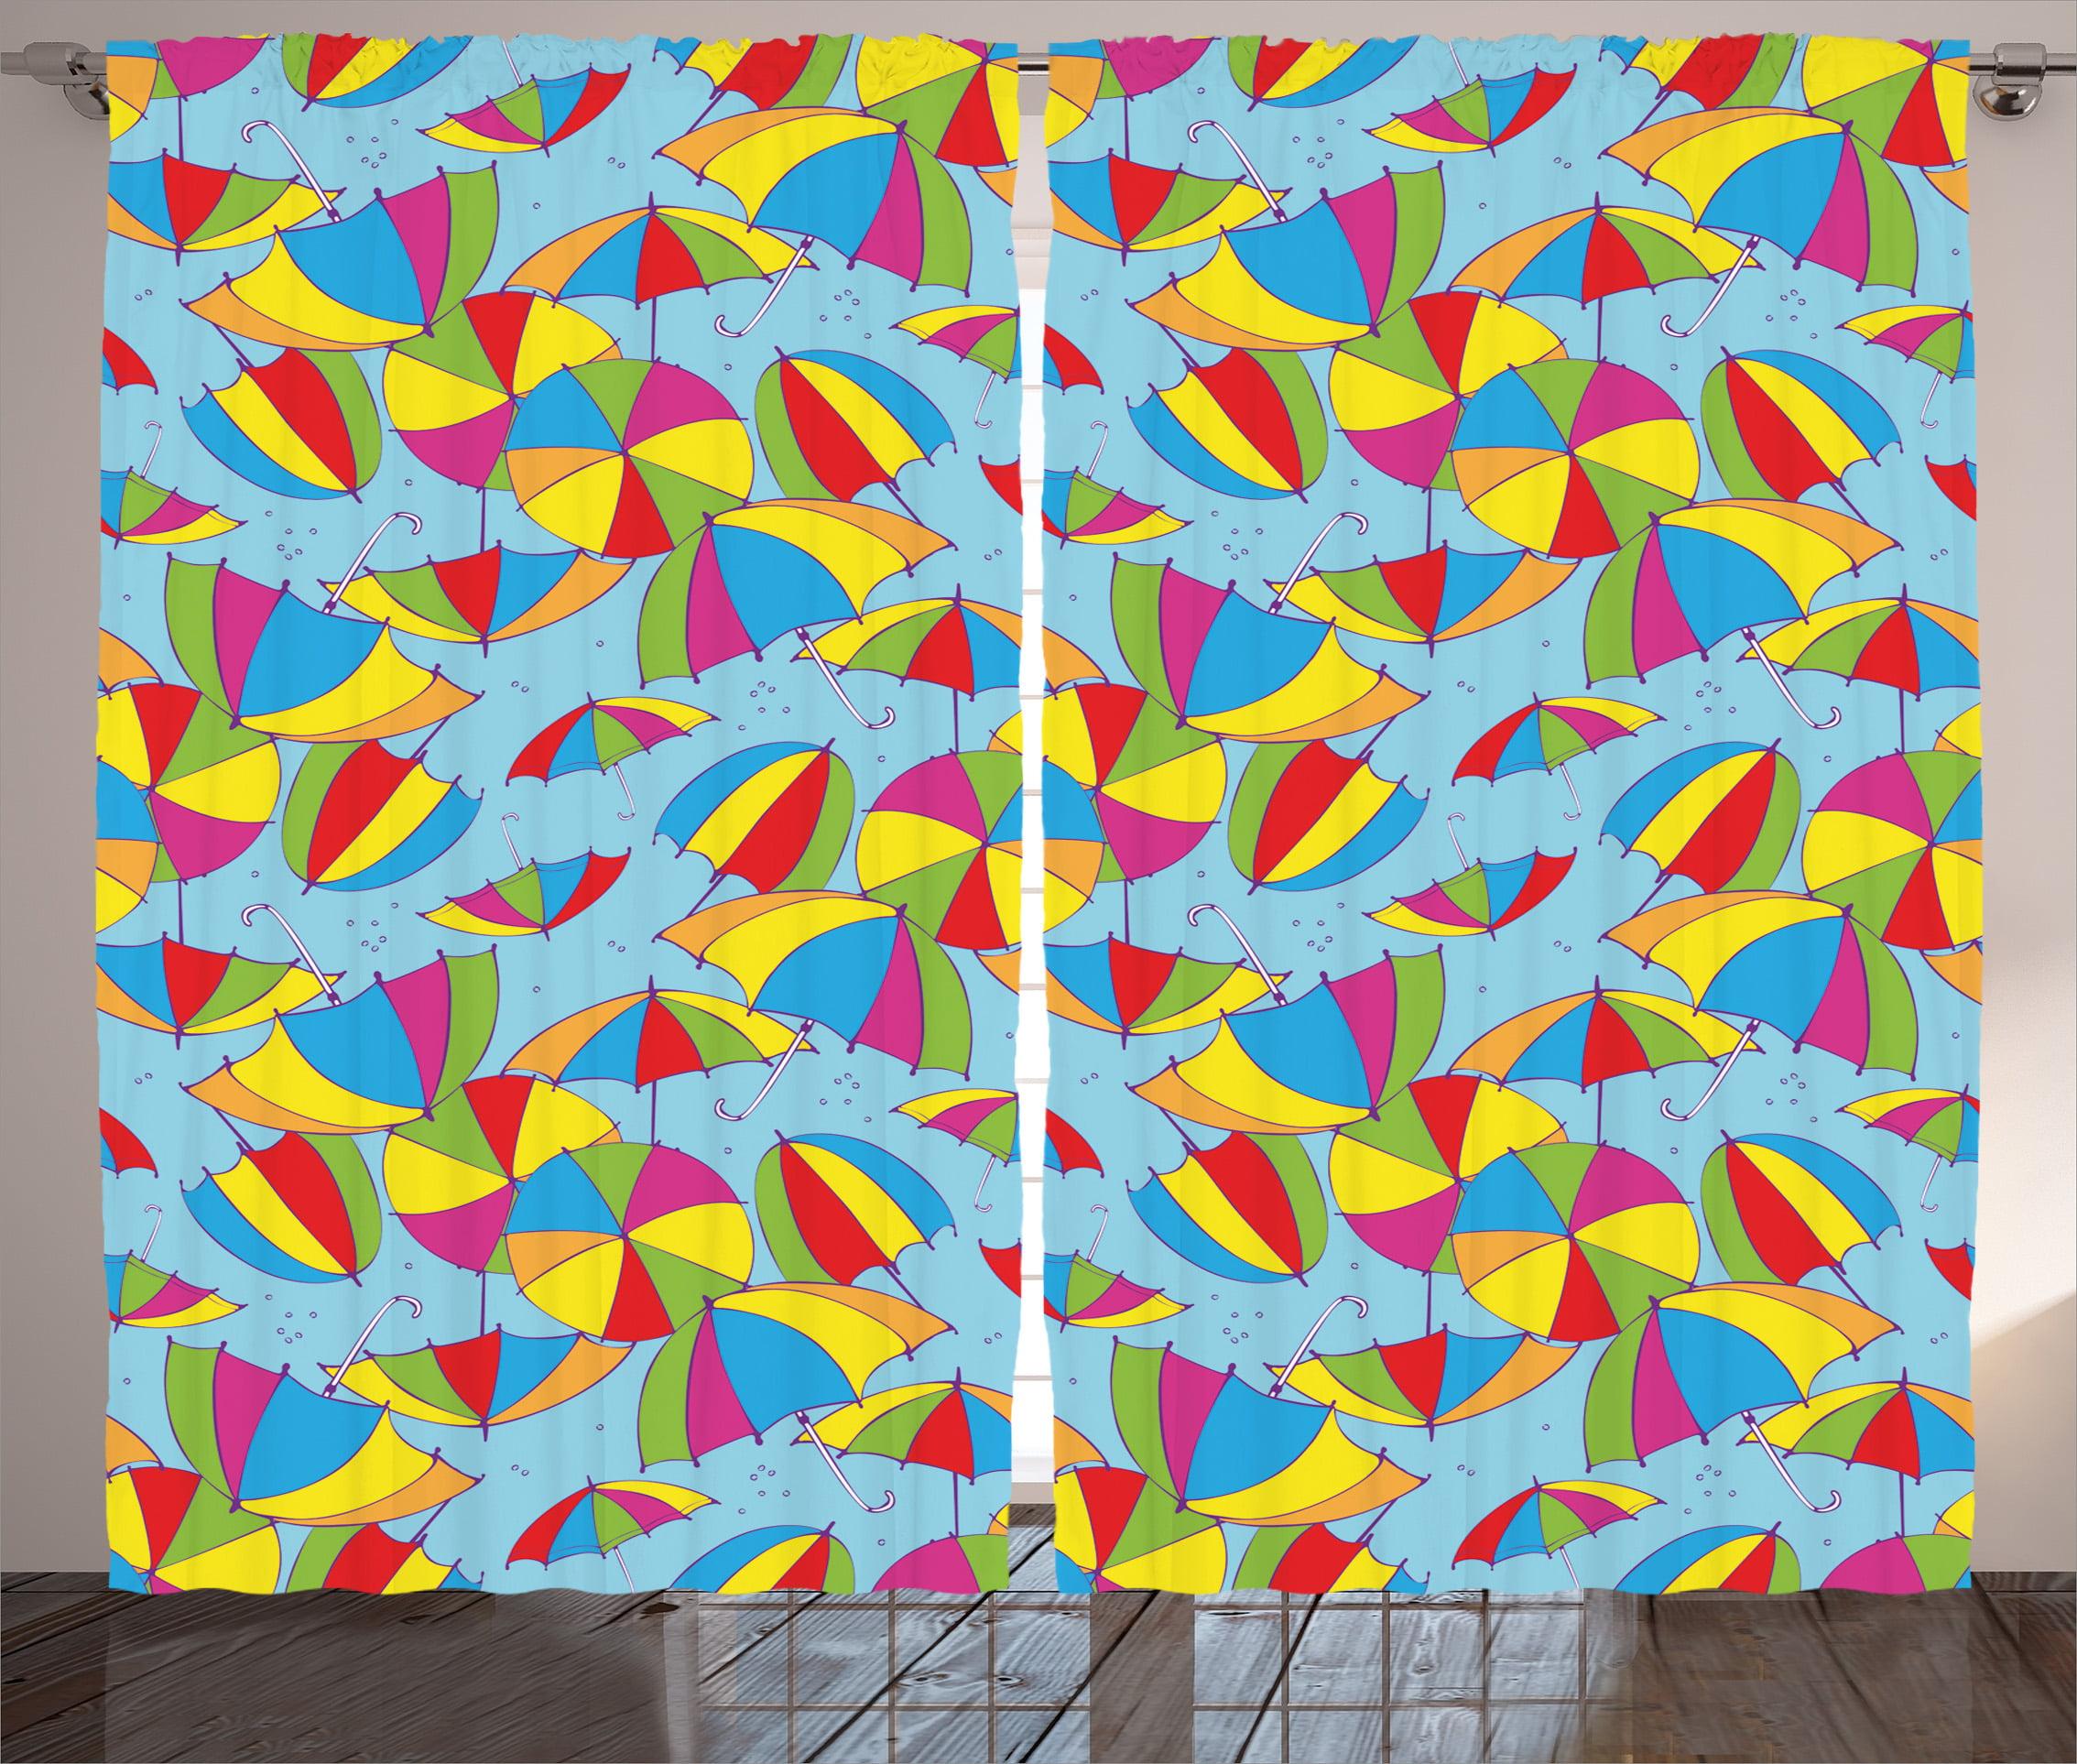 Apartment Decor Curtains 2 Panels Set, Cute Umbrellas in Rainbow Colors Romance Sun Shades Fall Protection Kid... by Kozmos